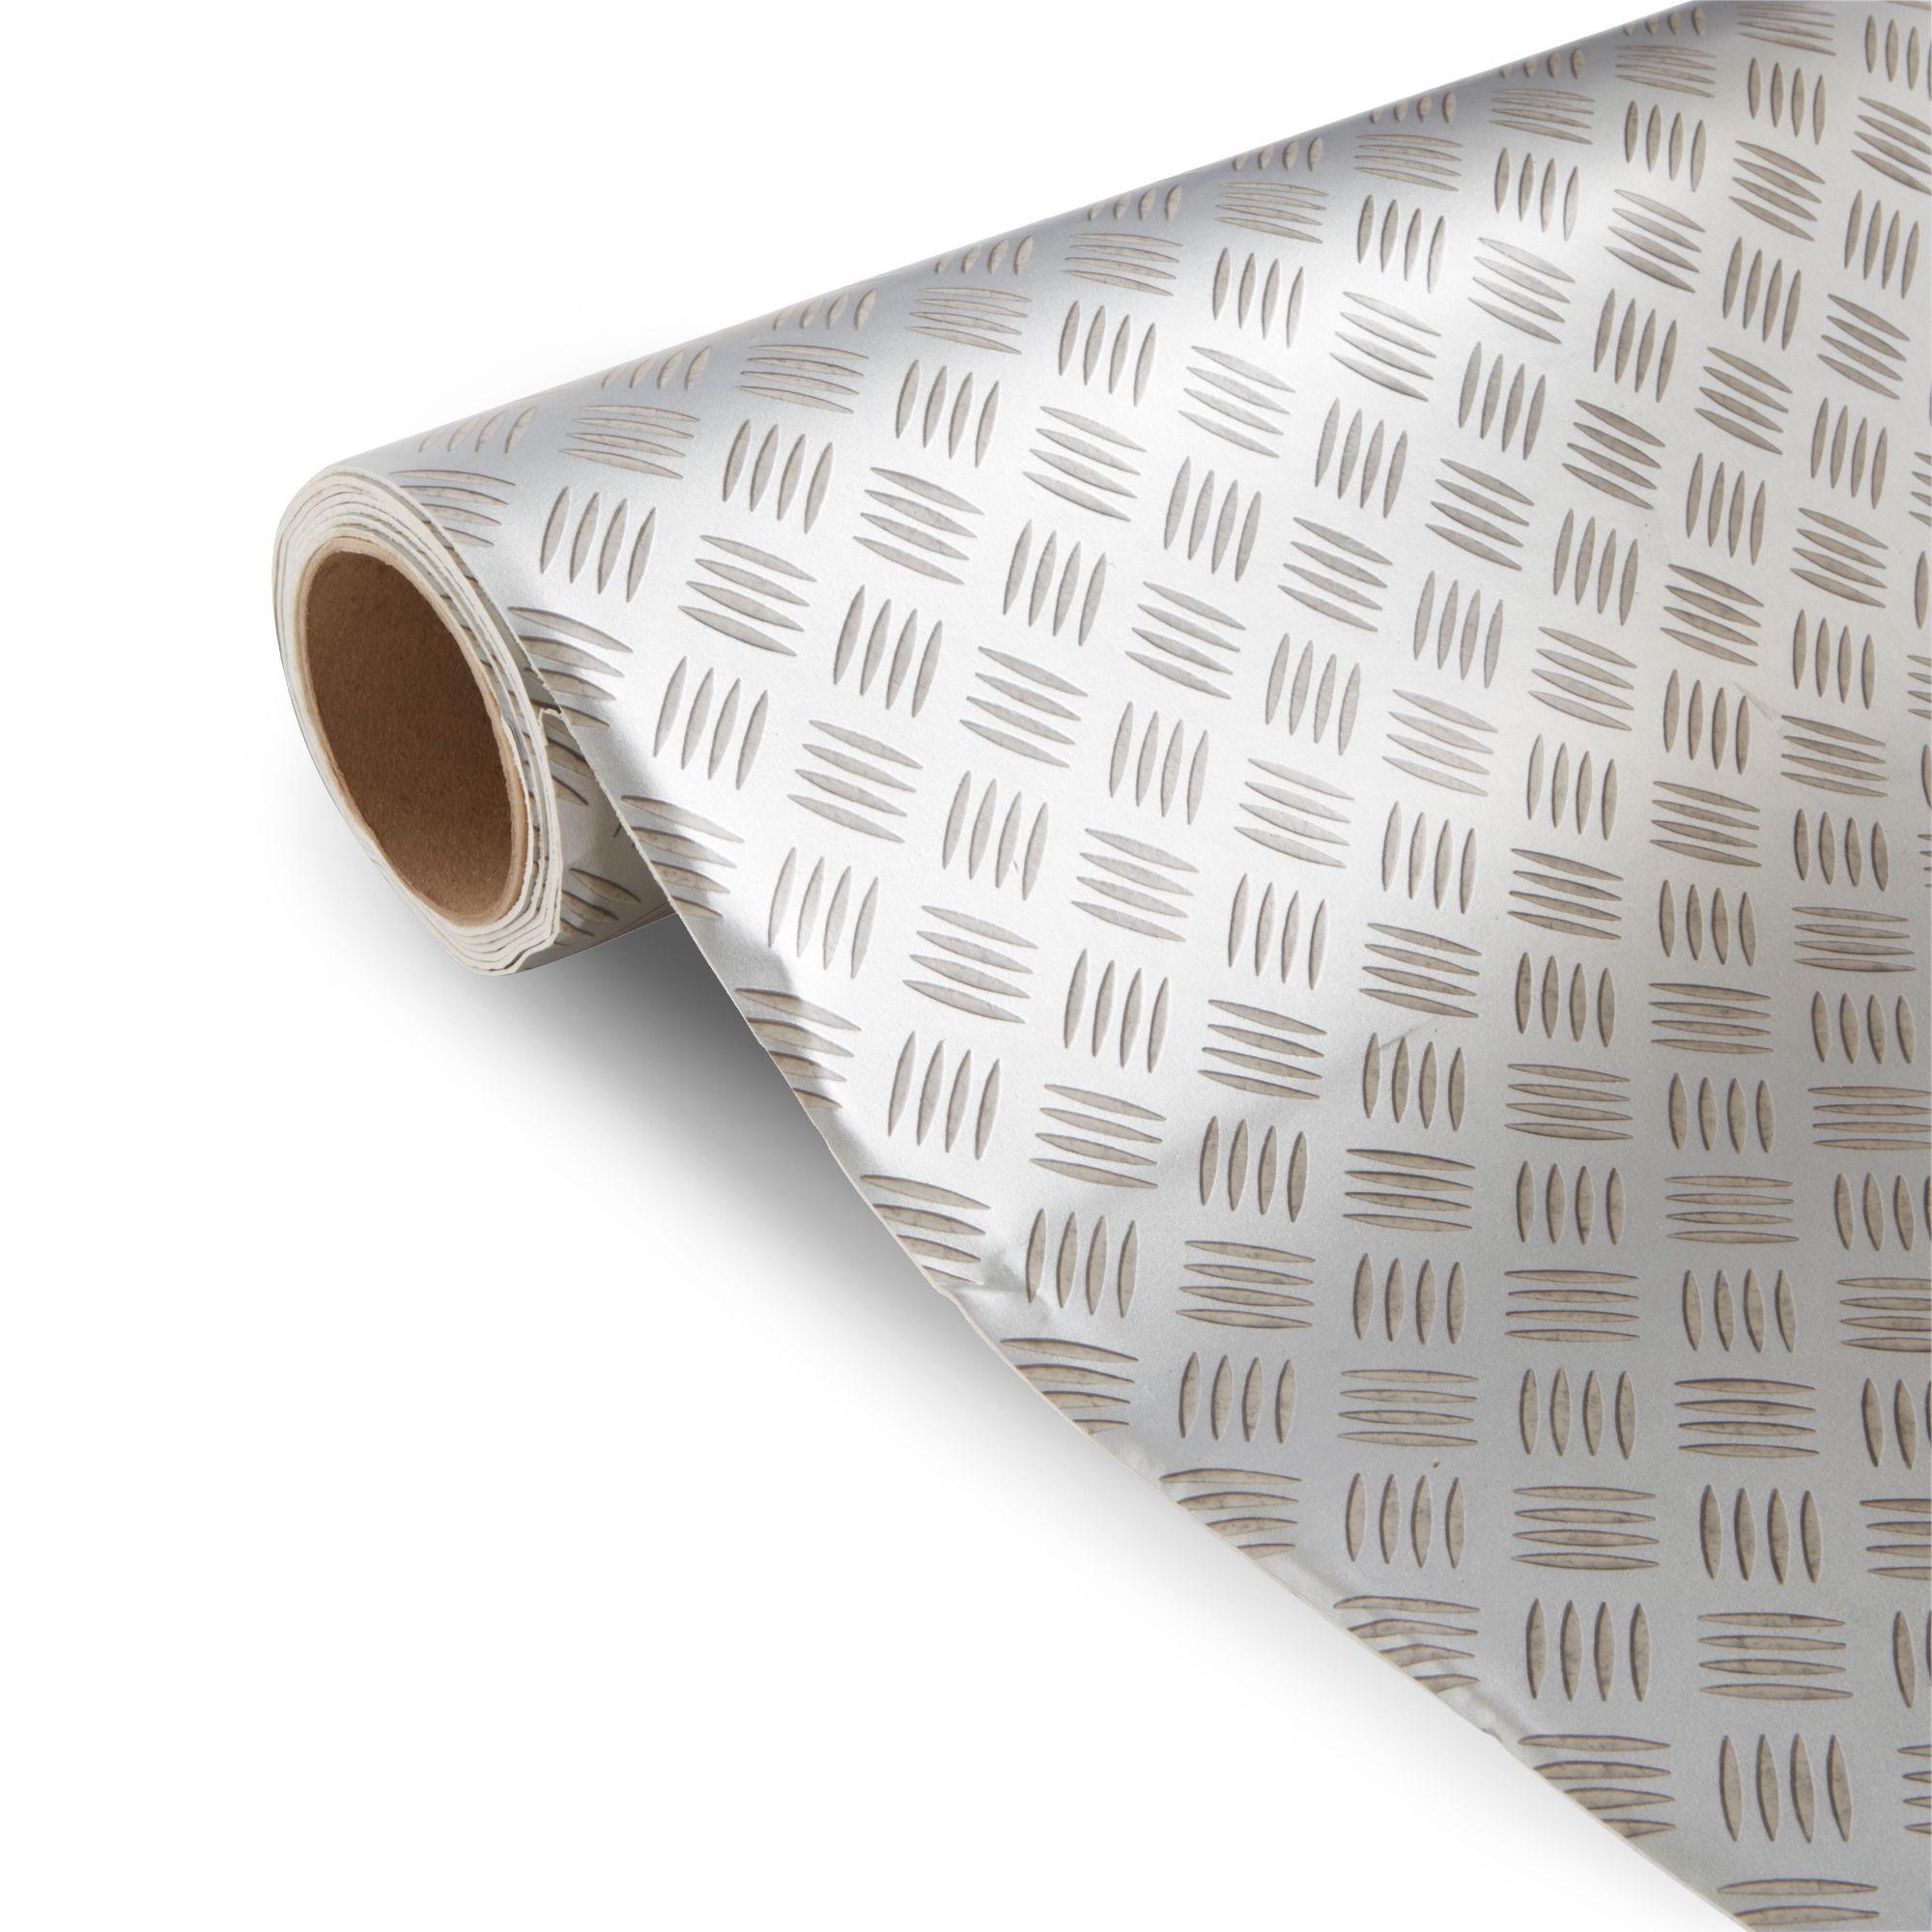 Diy at bq tabla silver tile effect vinyl 6m shiifo